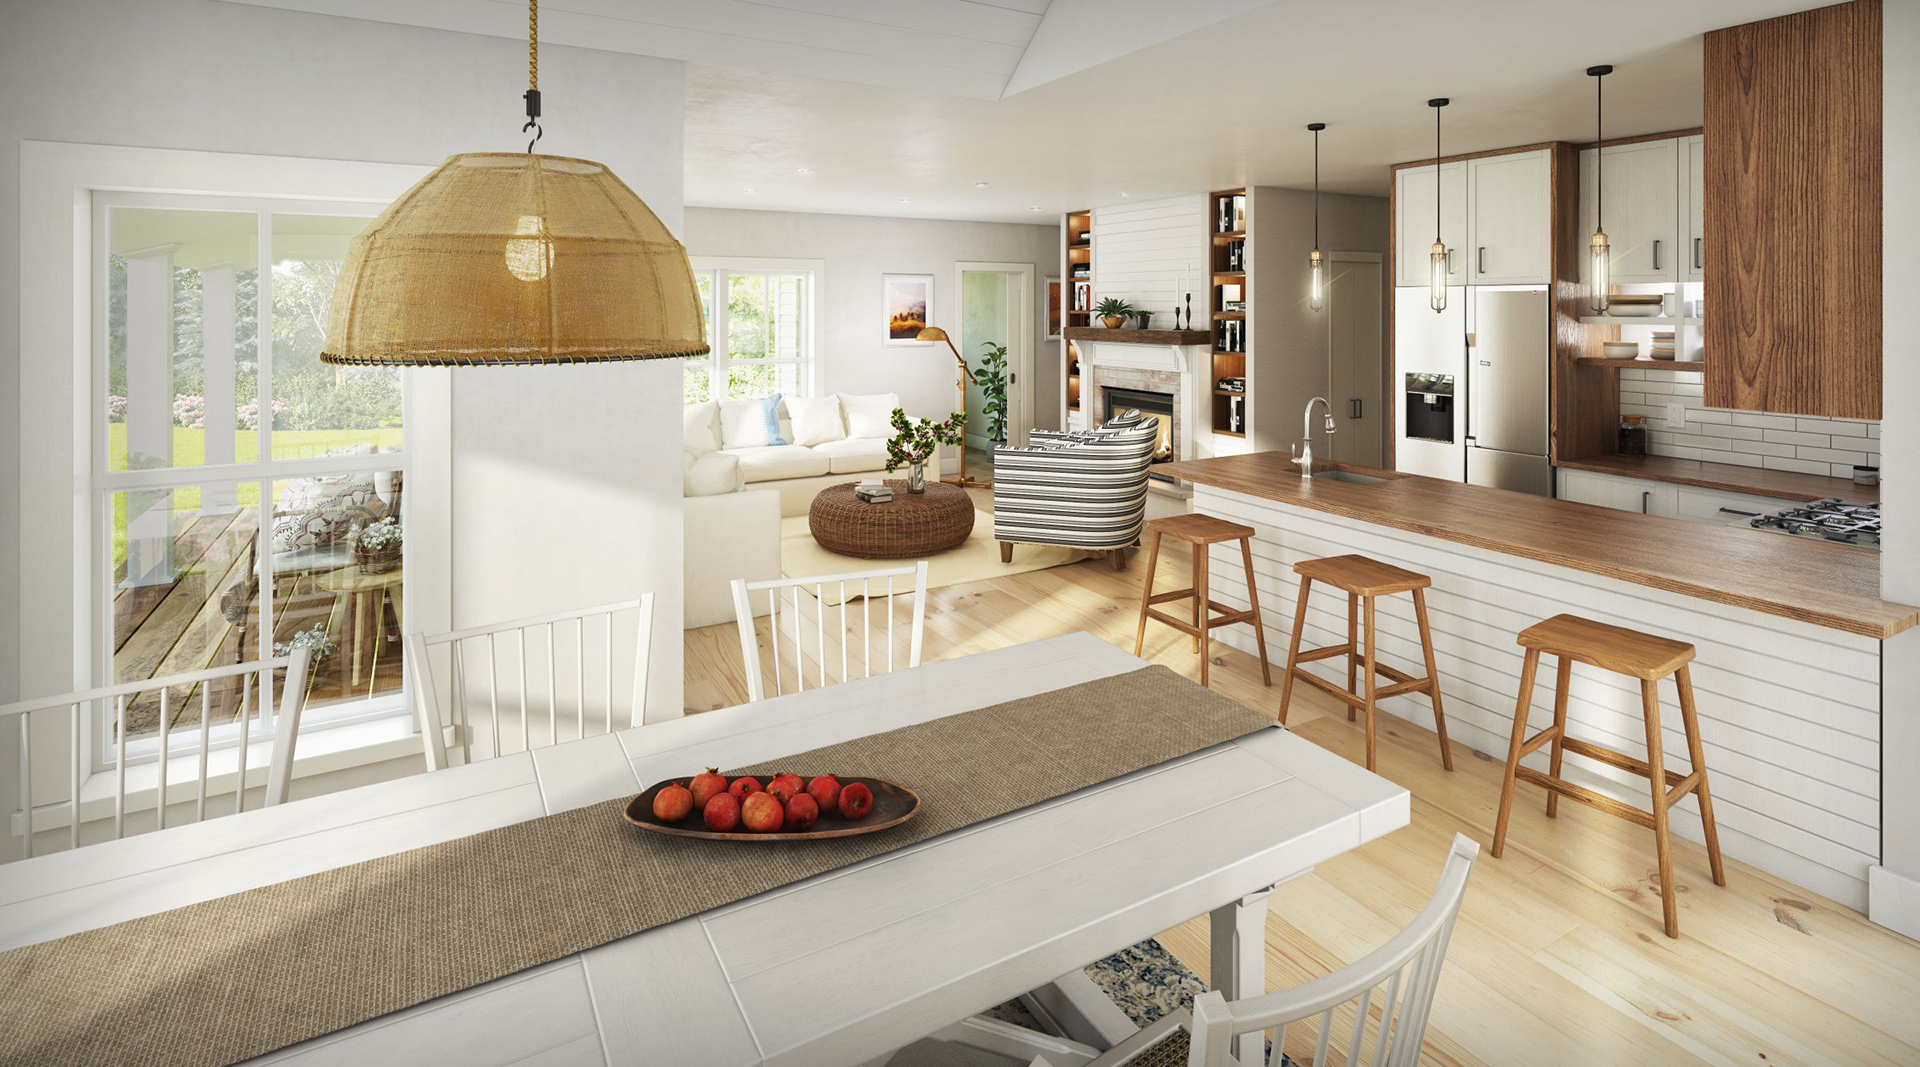 Profile Homes Cottage Interior Kitchen © 2018 Profile Homes